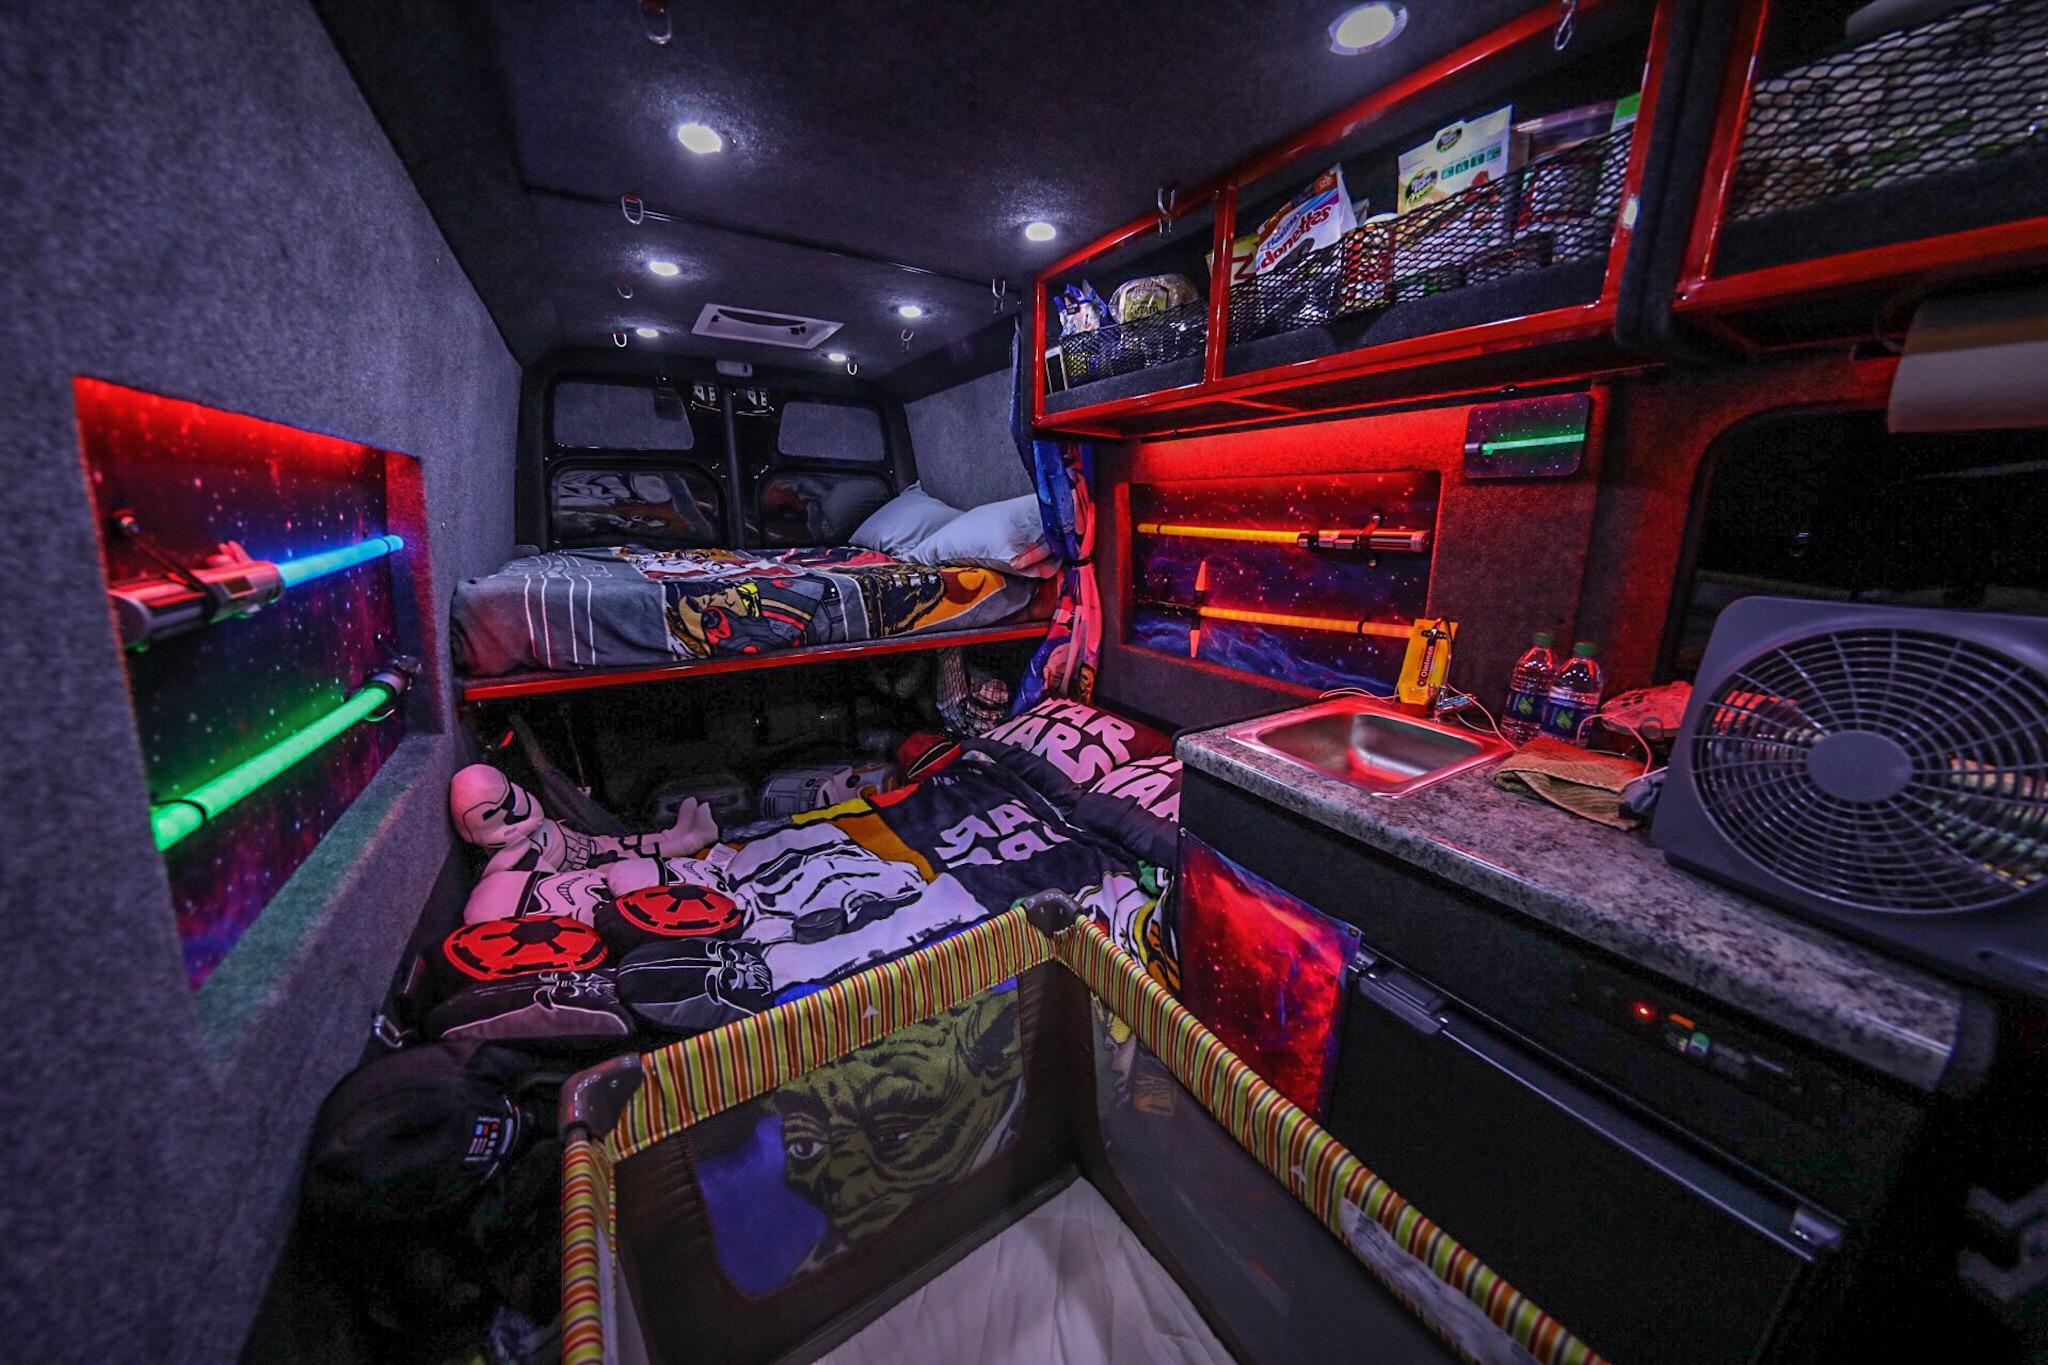 Star Wars Themed Van